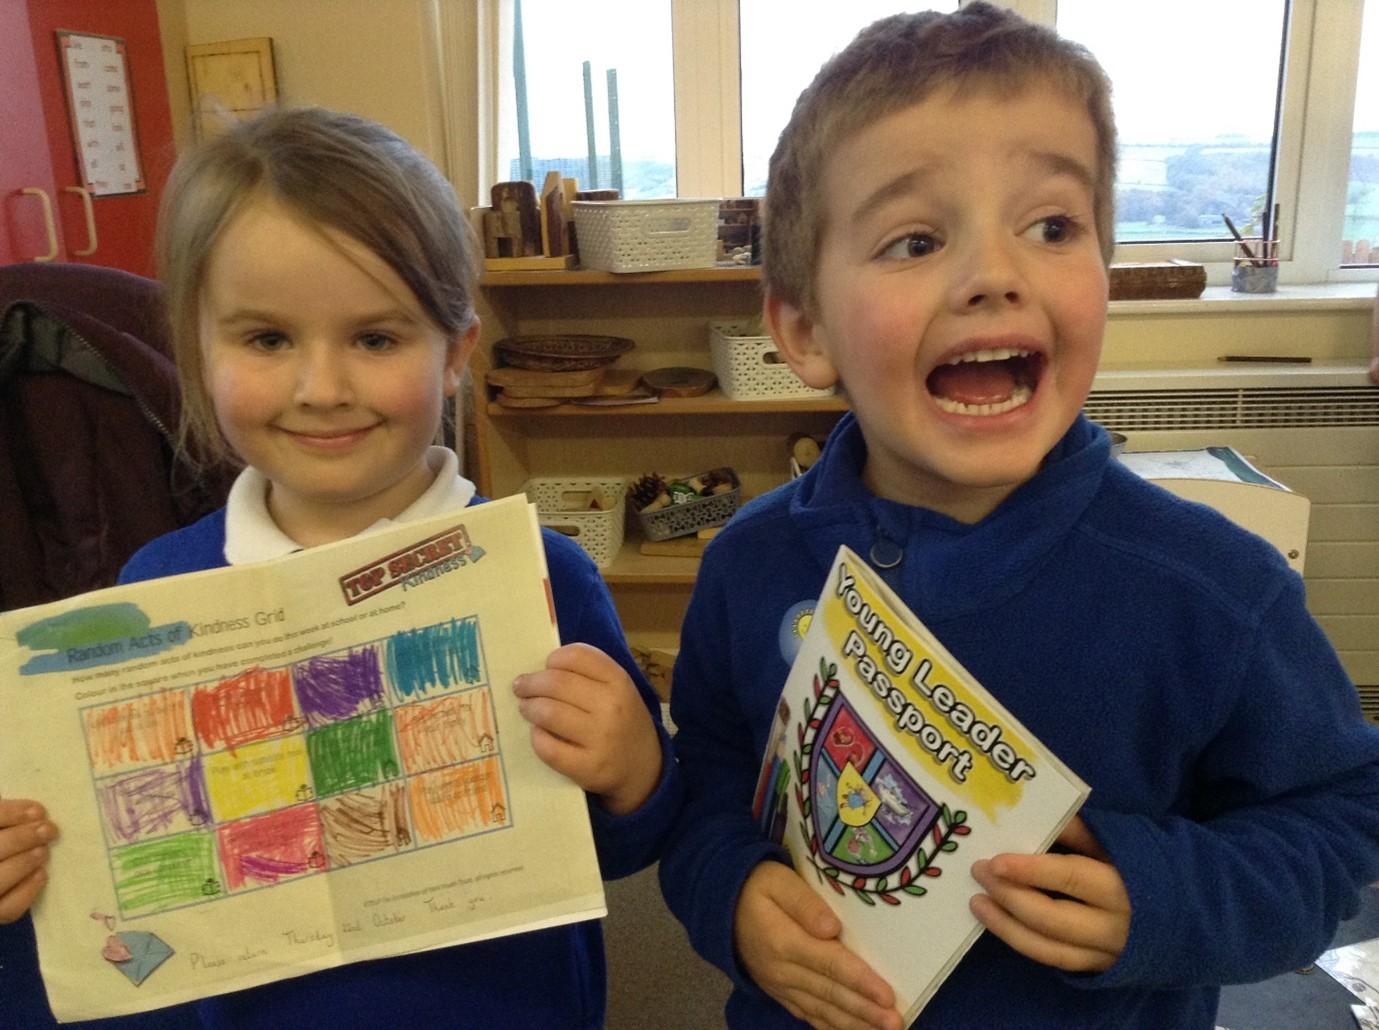 KS1 Pupils Spread Joy with Sunflowers